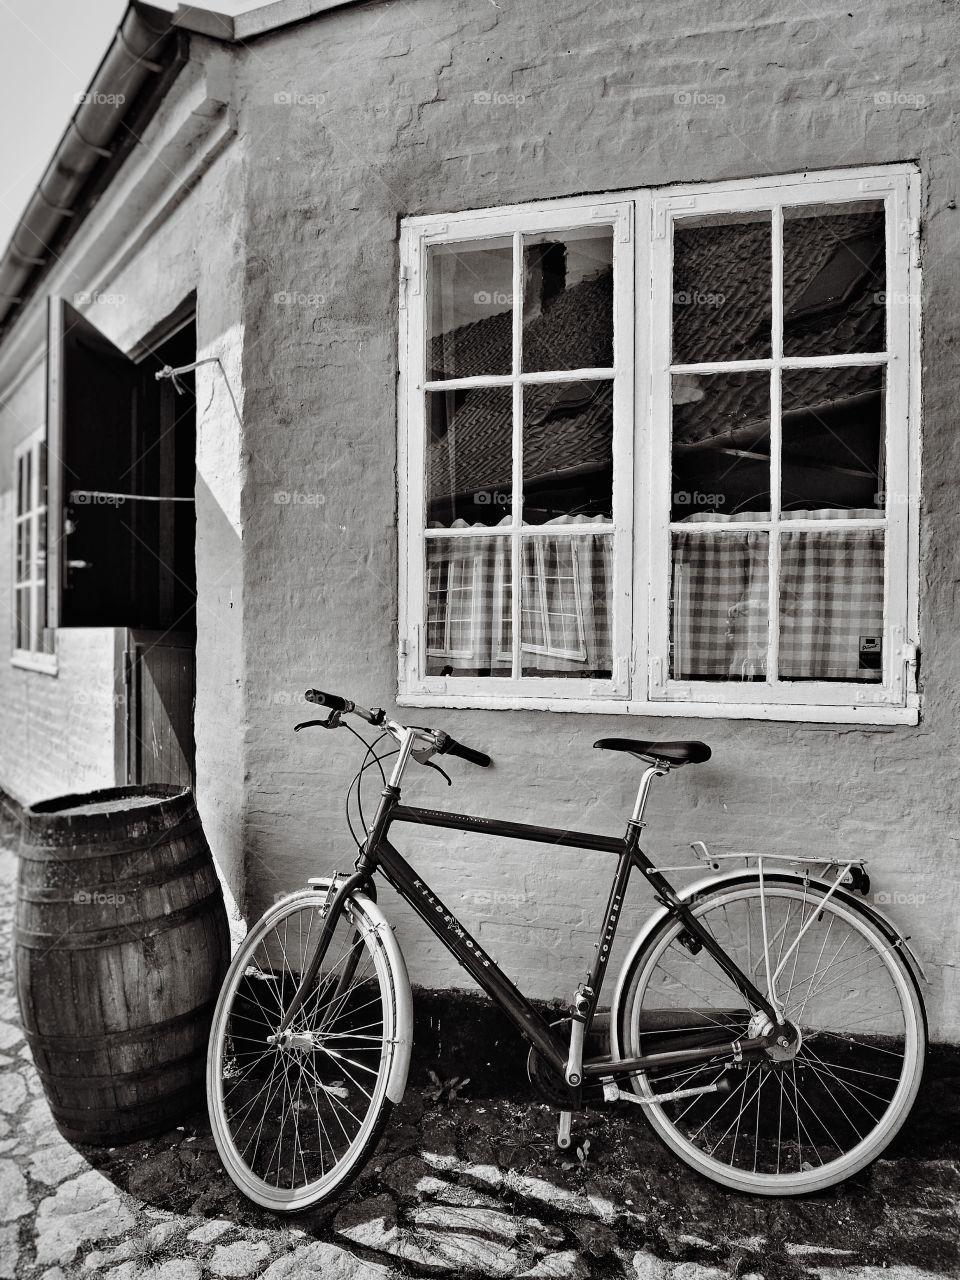 Easy life. Photo taken in Bornholm (Danish island)